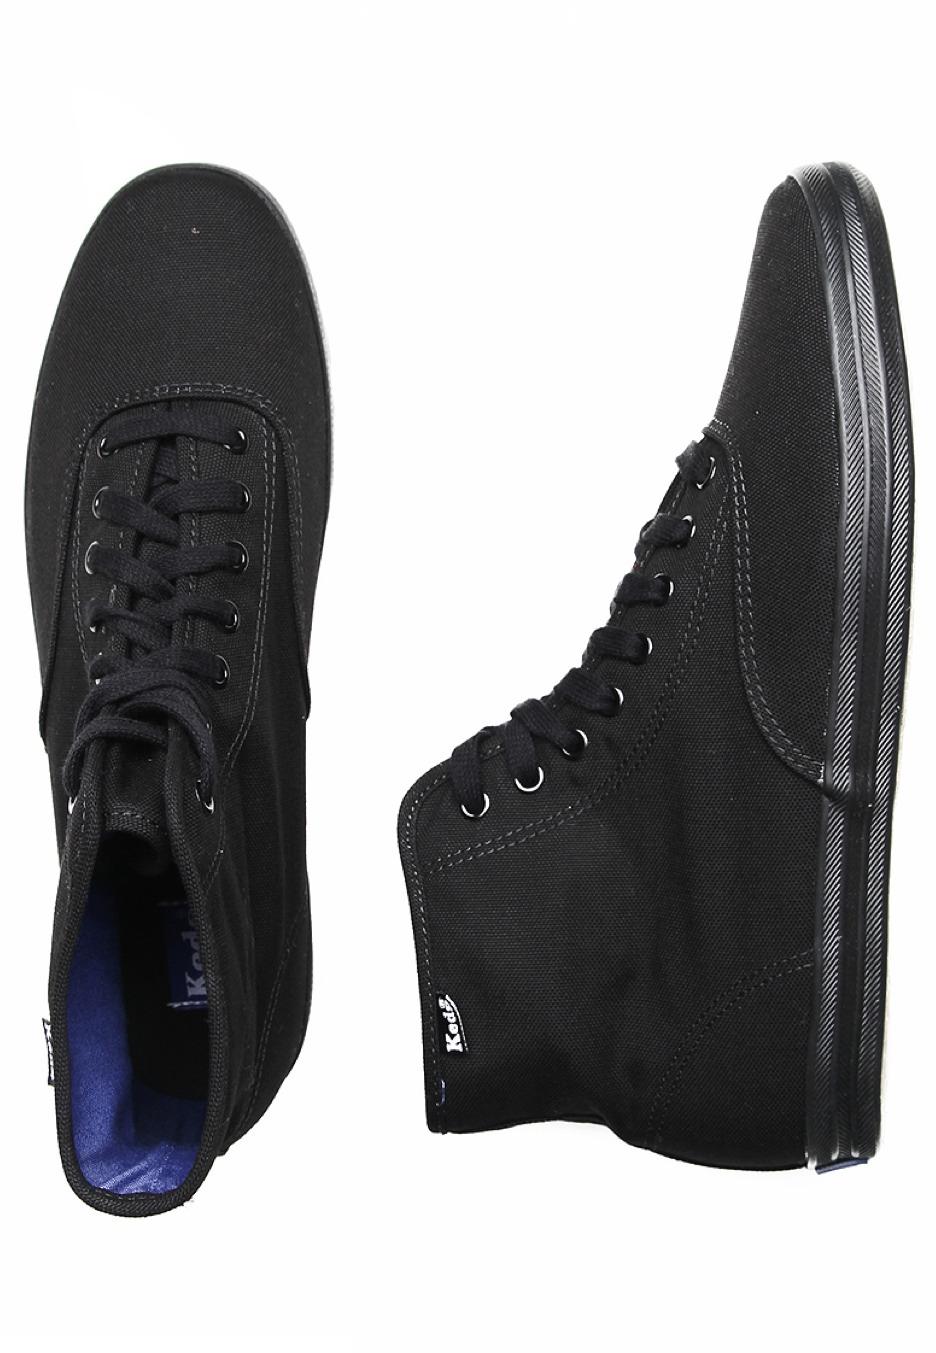 keds chion high black black shoes impericon